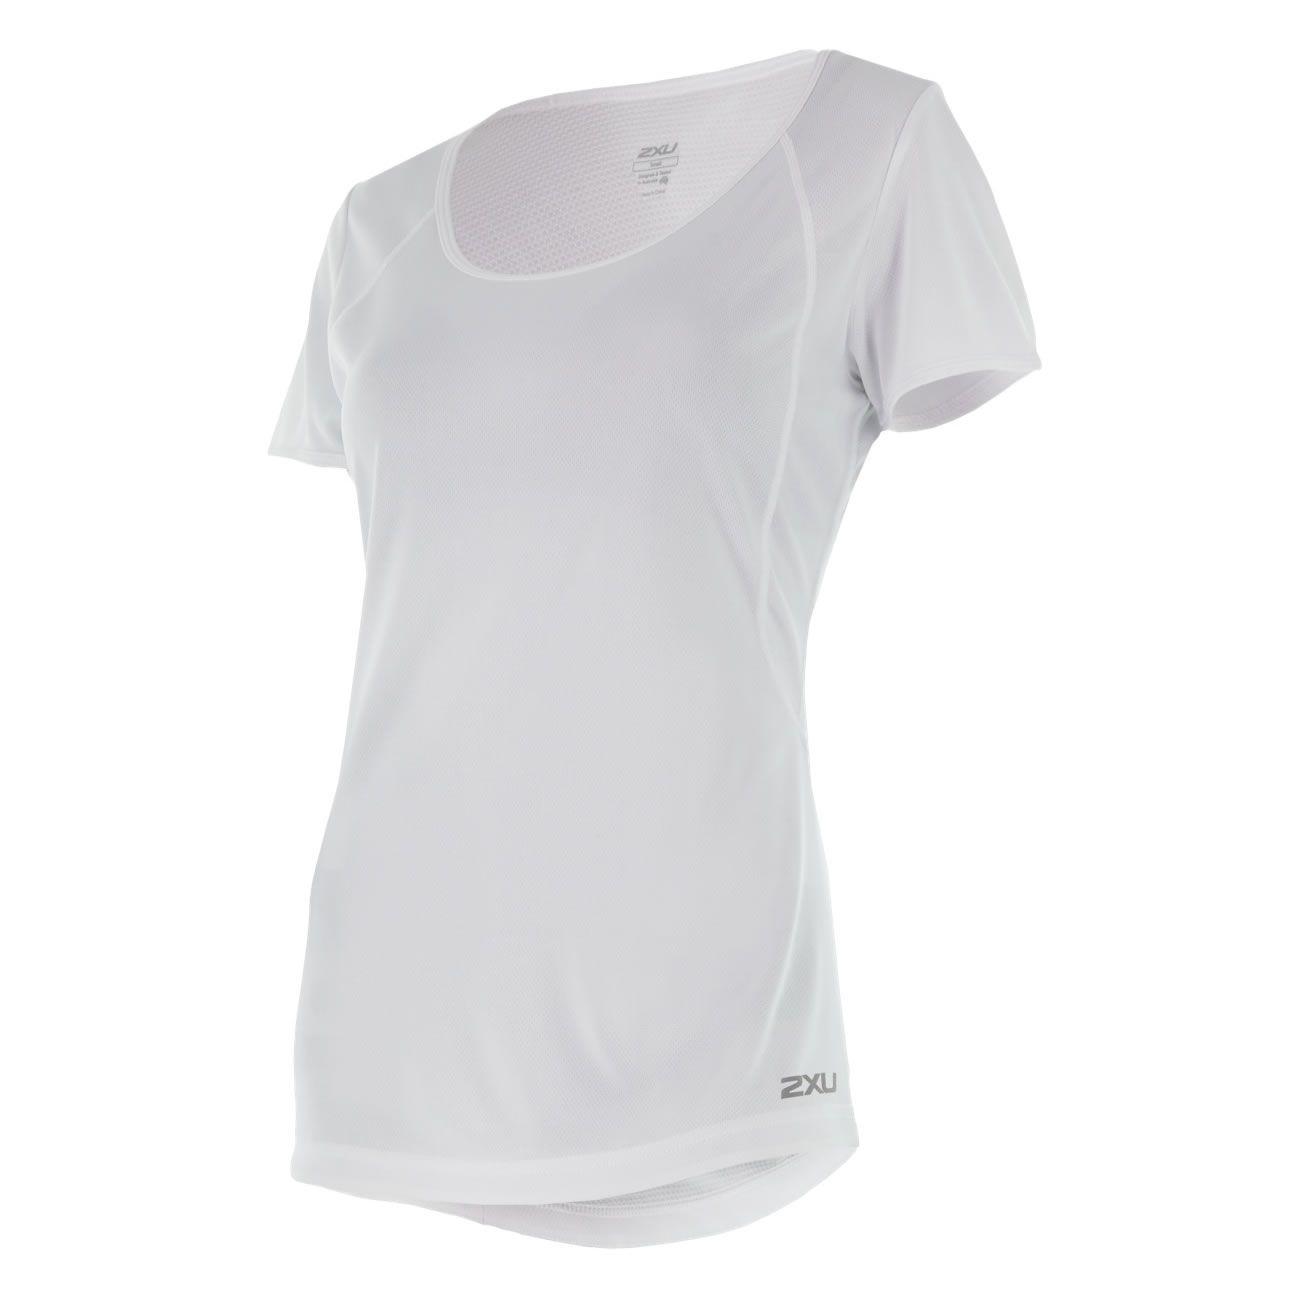 X-Vent Kurzarm Laufshirt Damen - 2XU